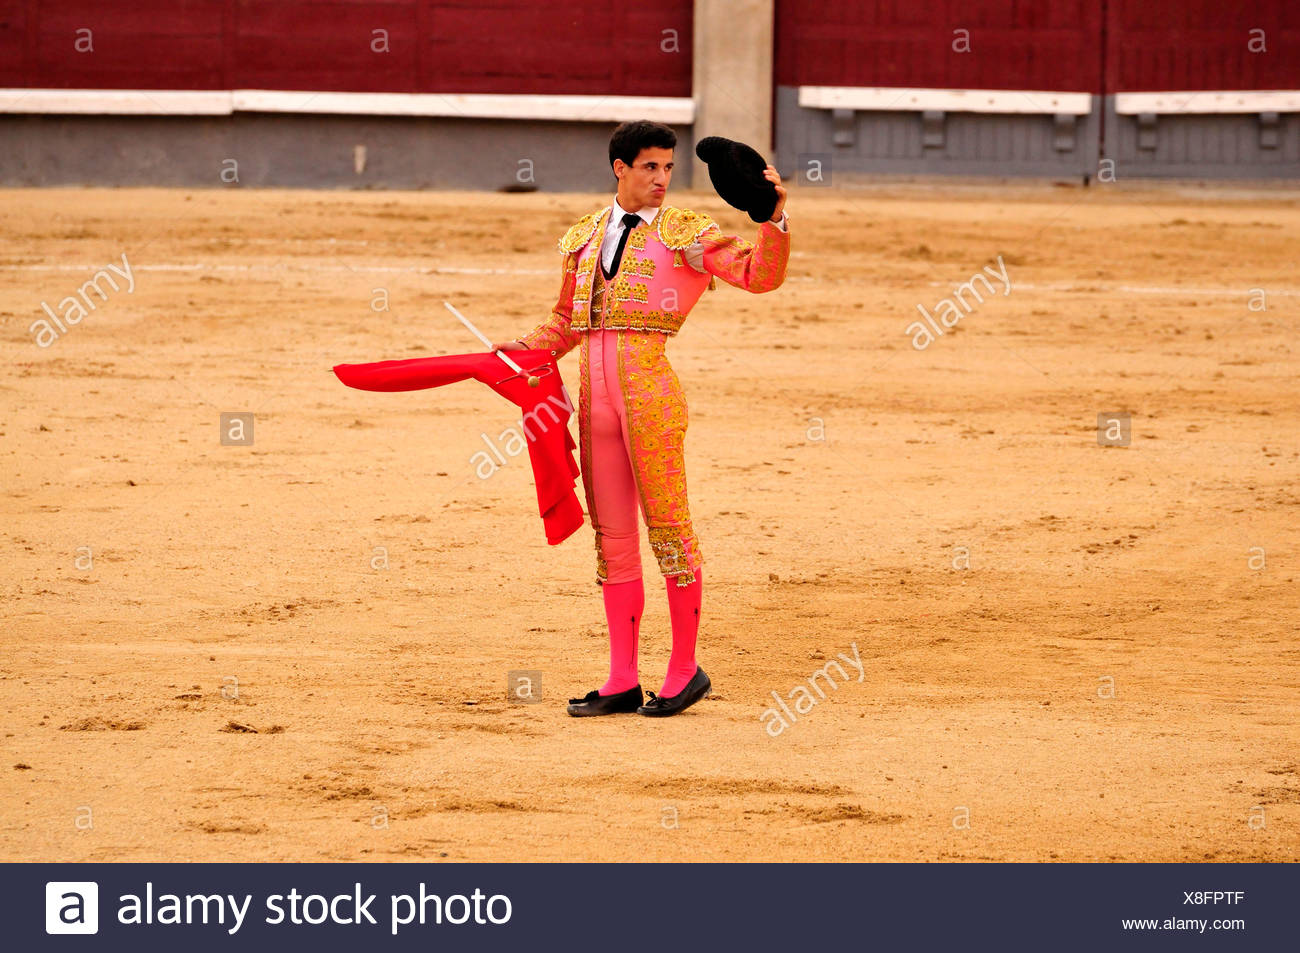 Bullfighter Hat Imágenes De Stock   Bullfighter Hat Fotos De Stock ... 0e5de9a8d4a